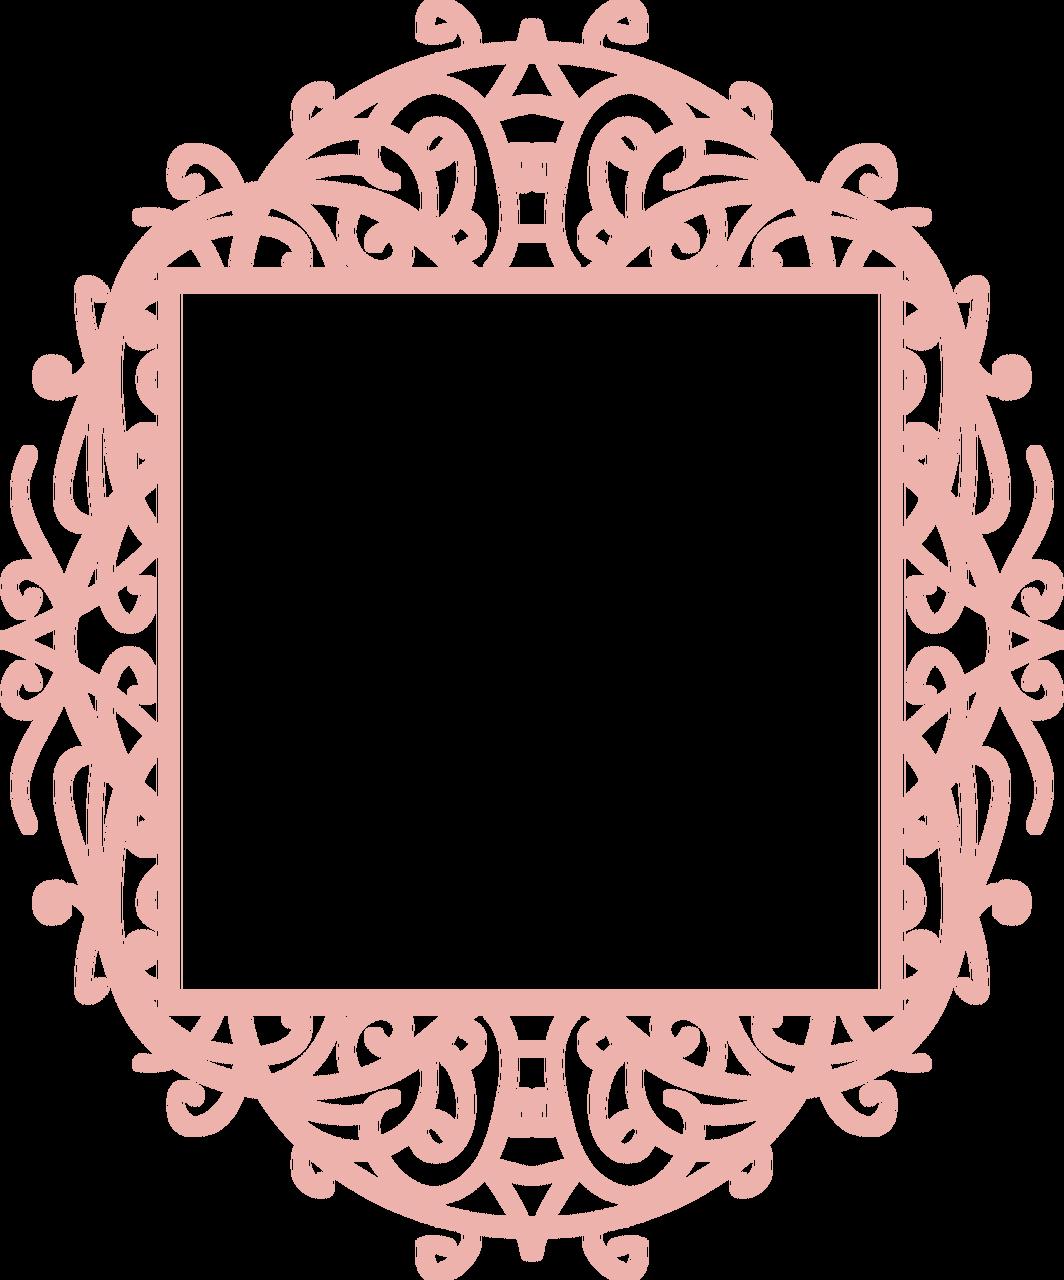 Wedding Doily SVG Cut File